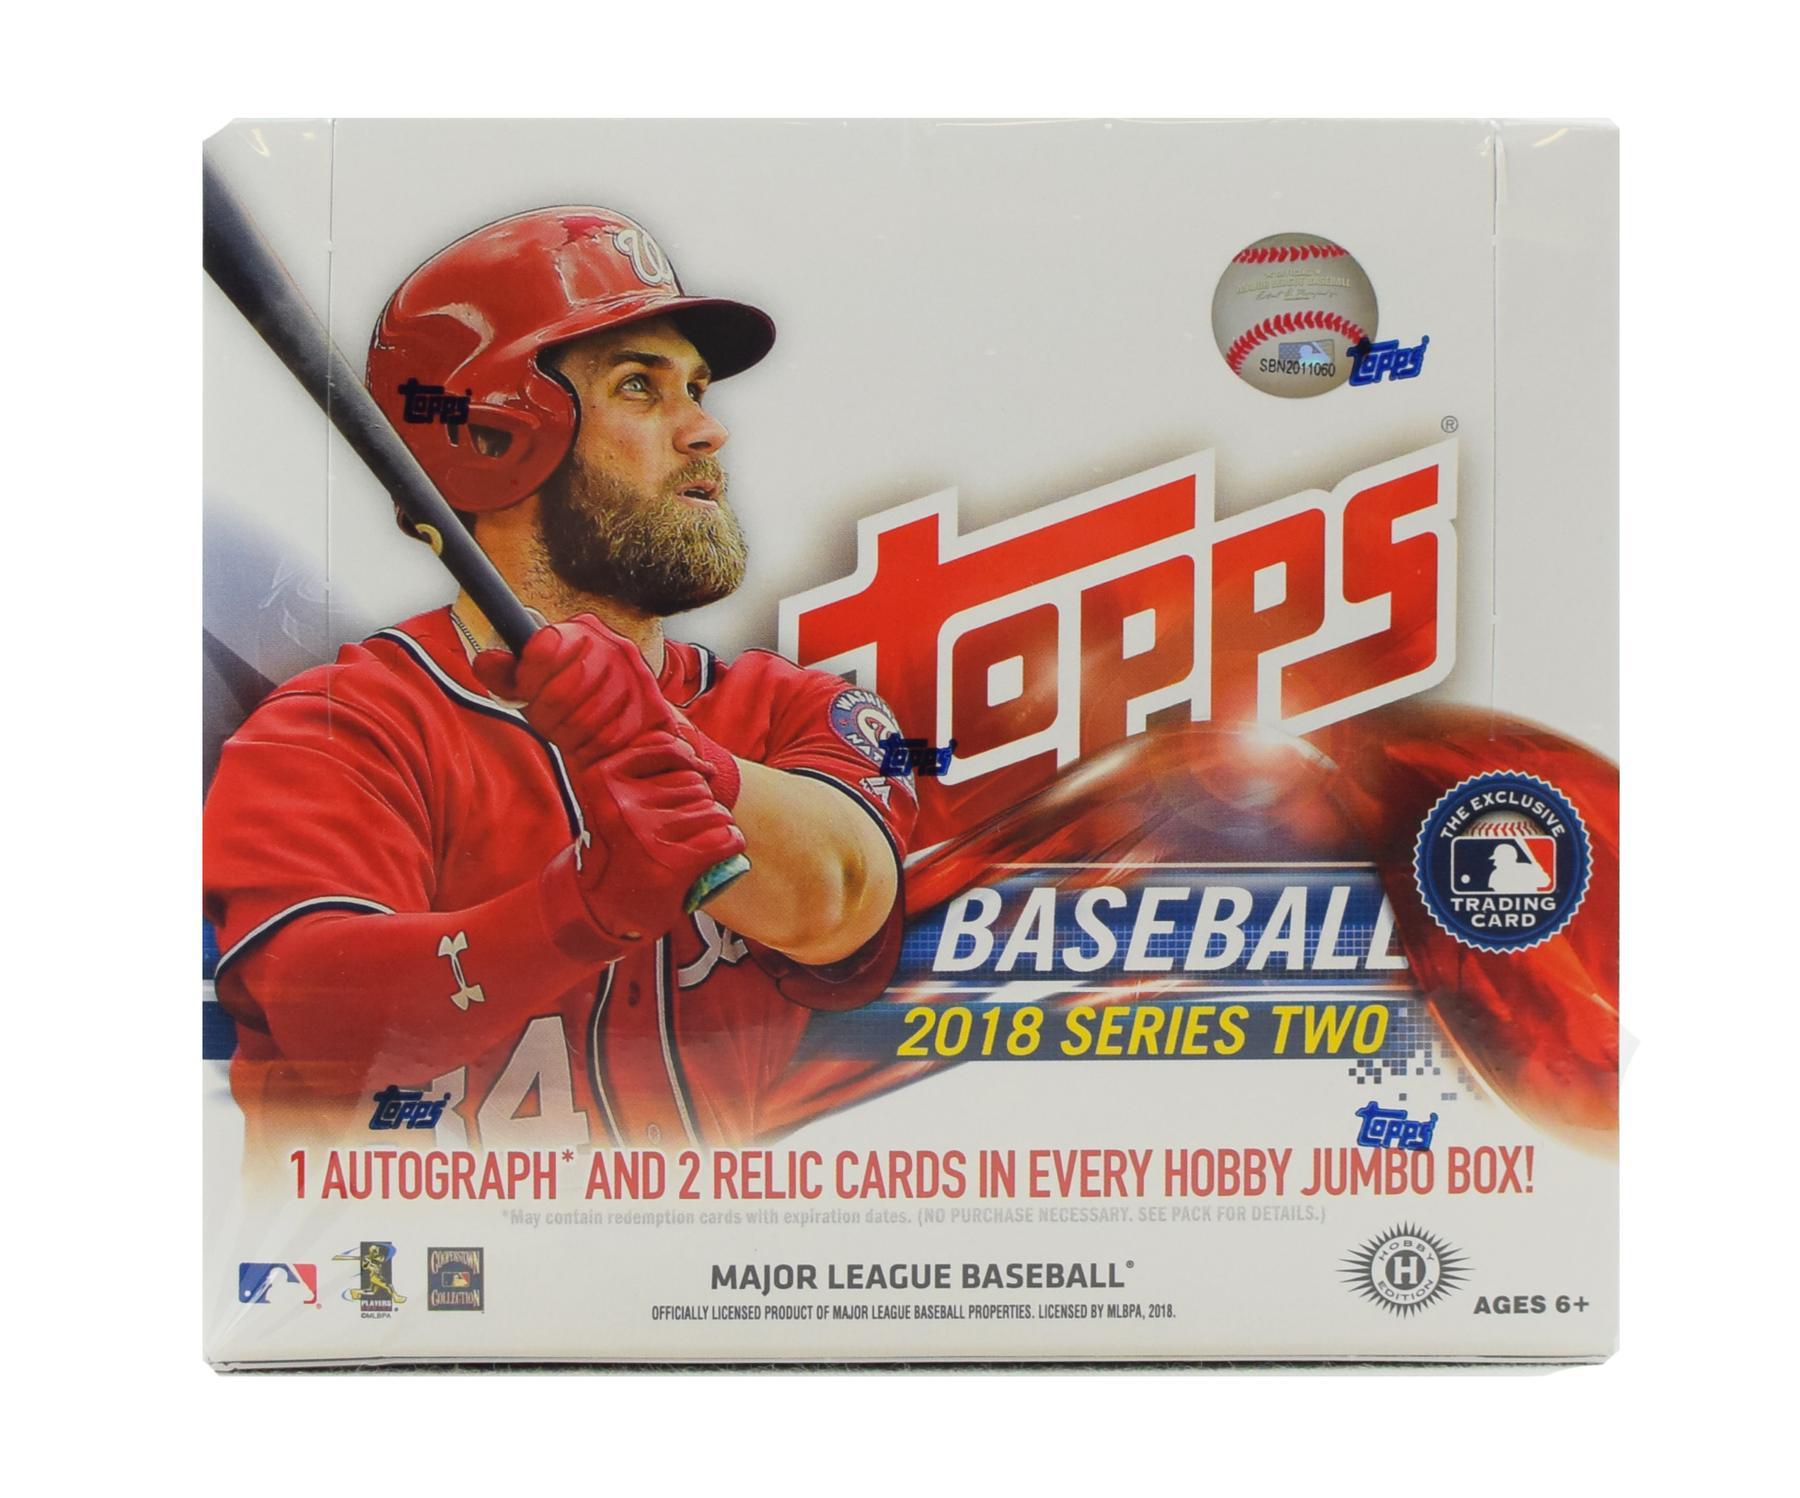 a11f41a08b6 2018 Topps Series 2 Baseball Hobby Jumbo Box